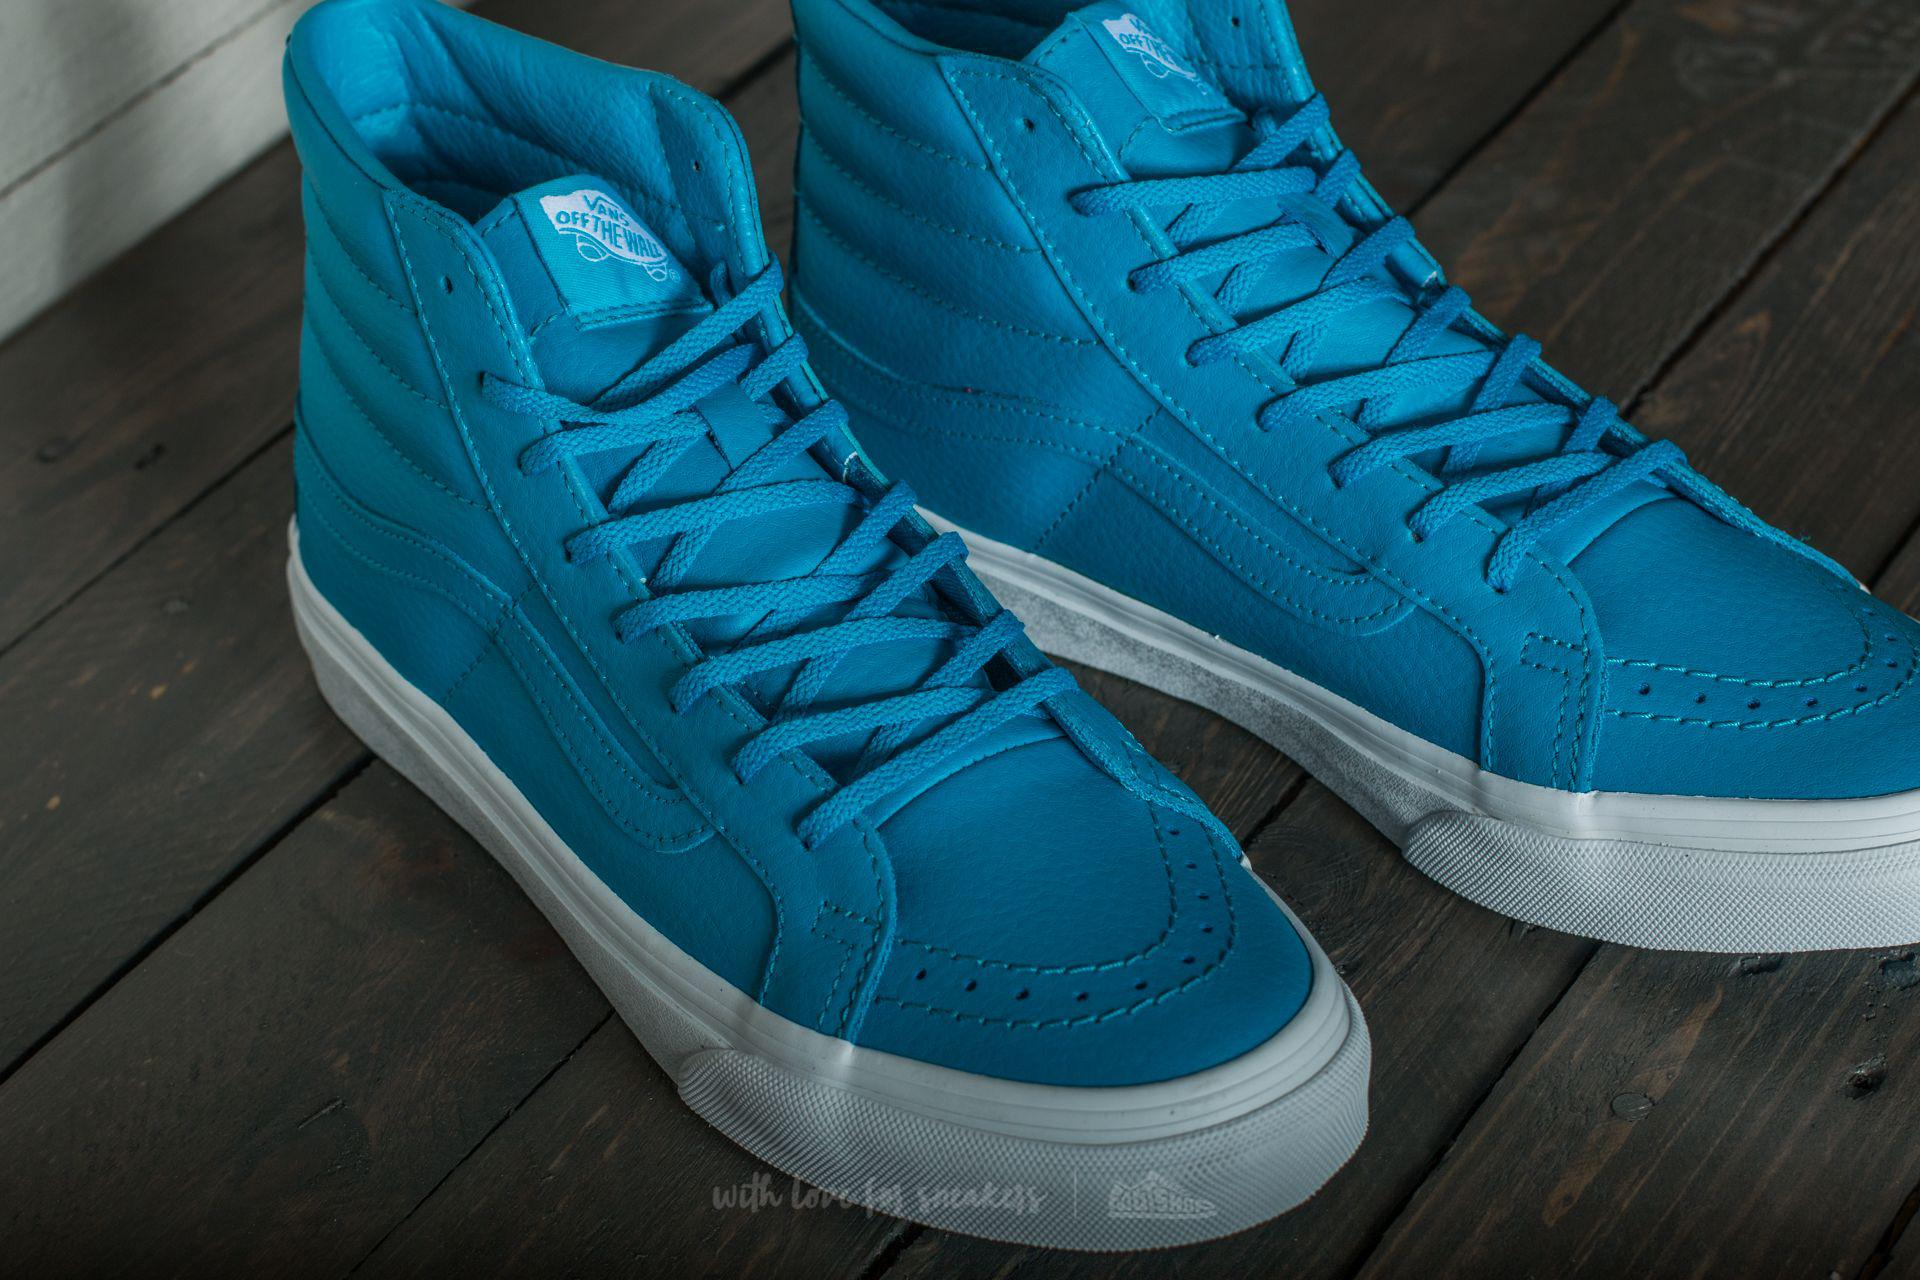 8b9f1601a39a69 Lyst - Vans Sk8-hi Slim (neon Leather) Neon Blue in Blue for Men